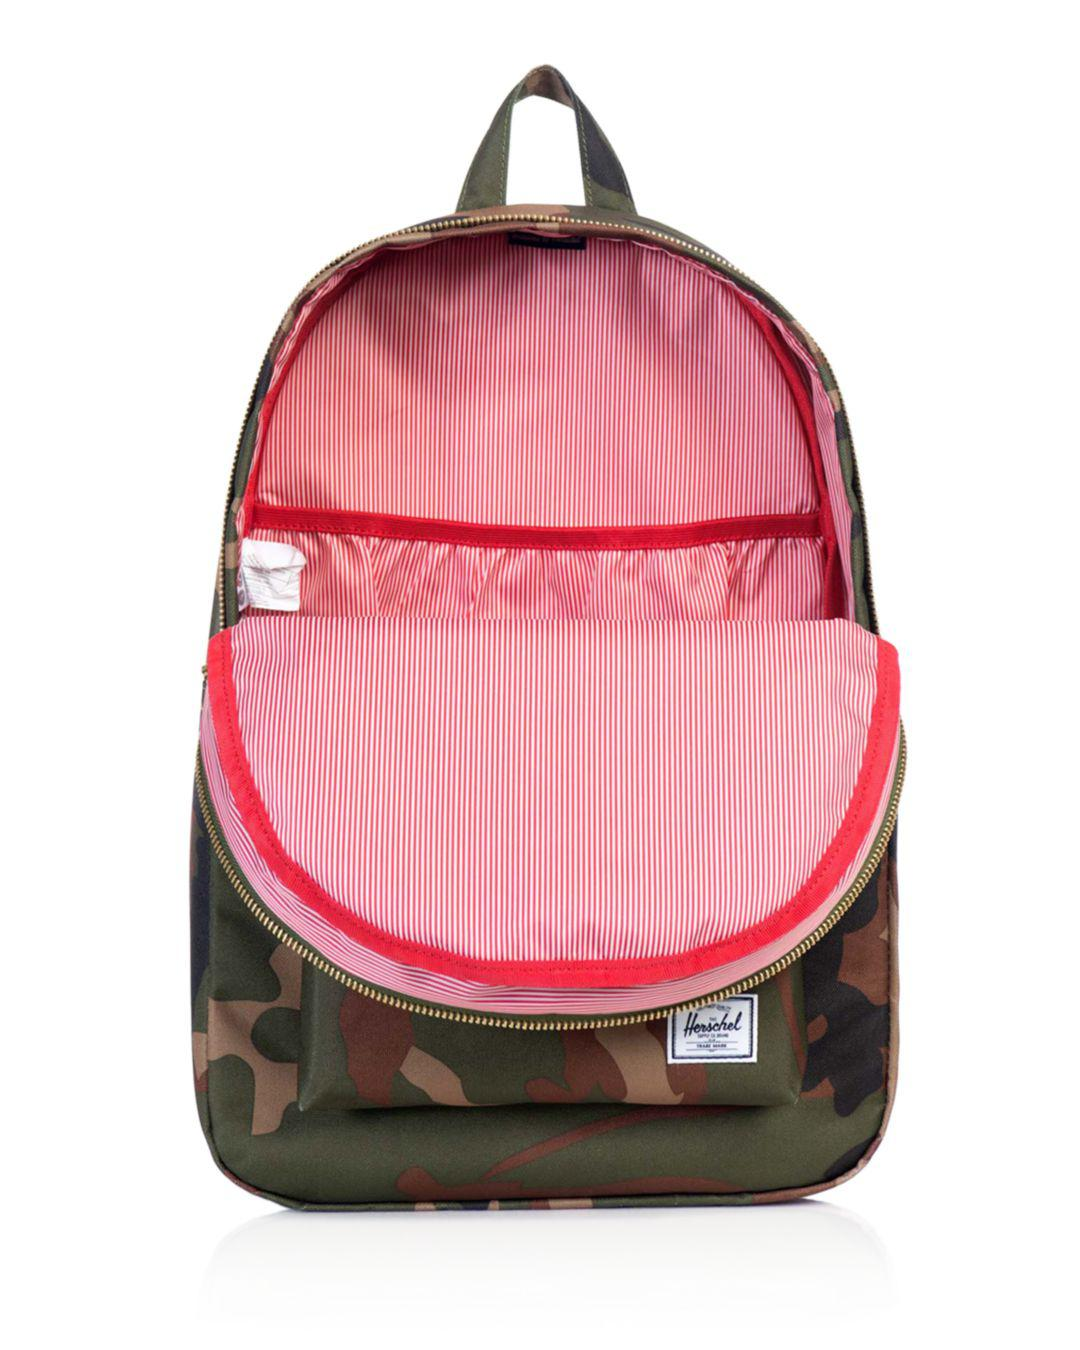 27e639740f7 Lyst - Herschel Supply Co. Settlement Backpack for Men - Save 21%